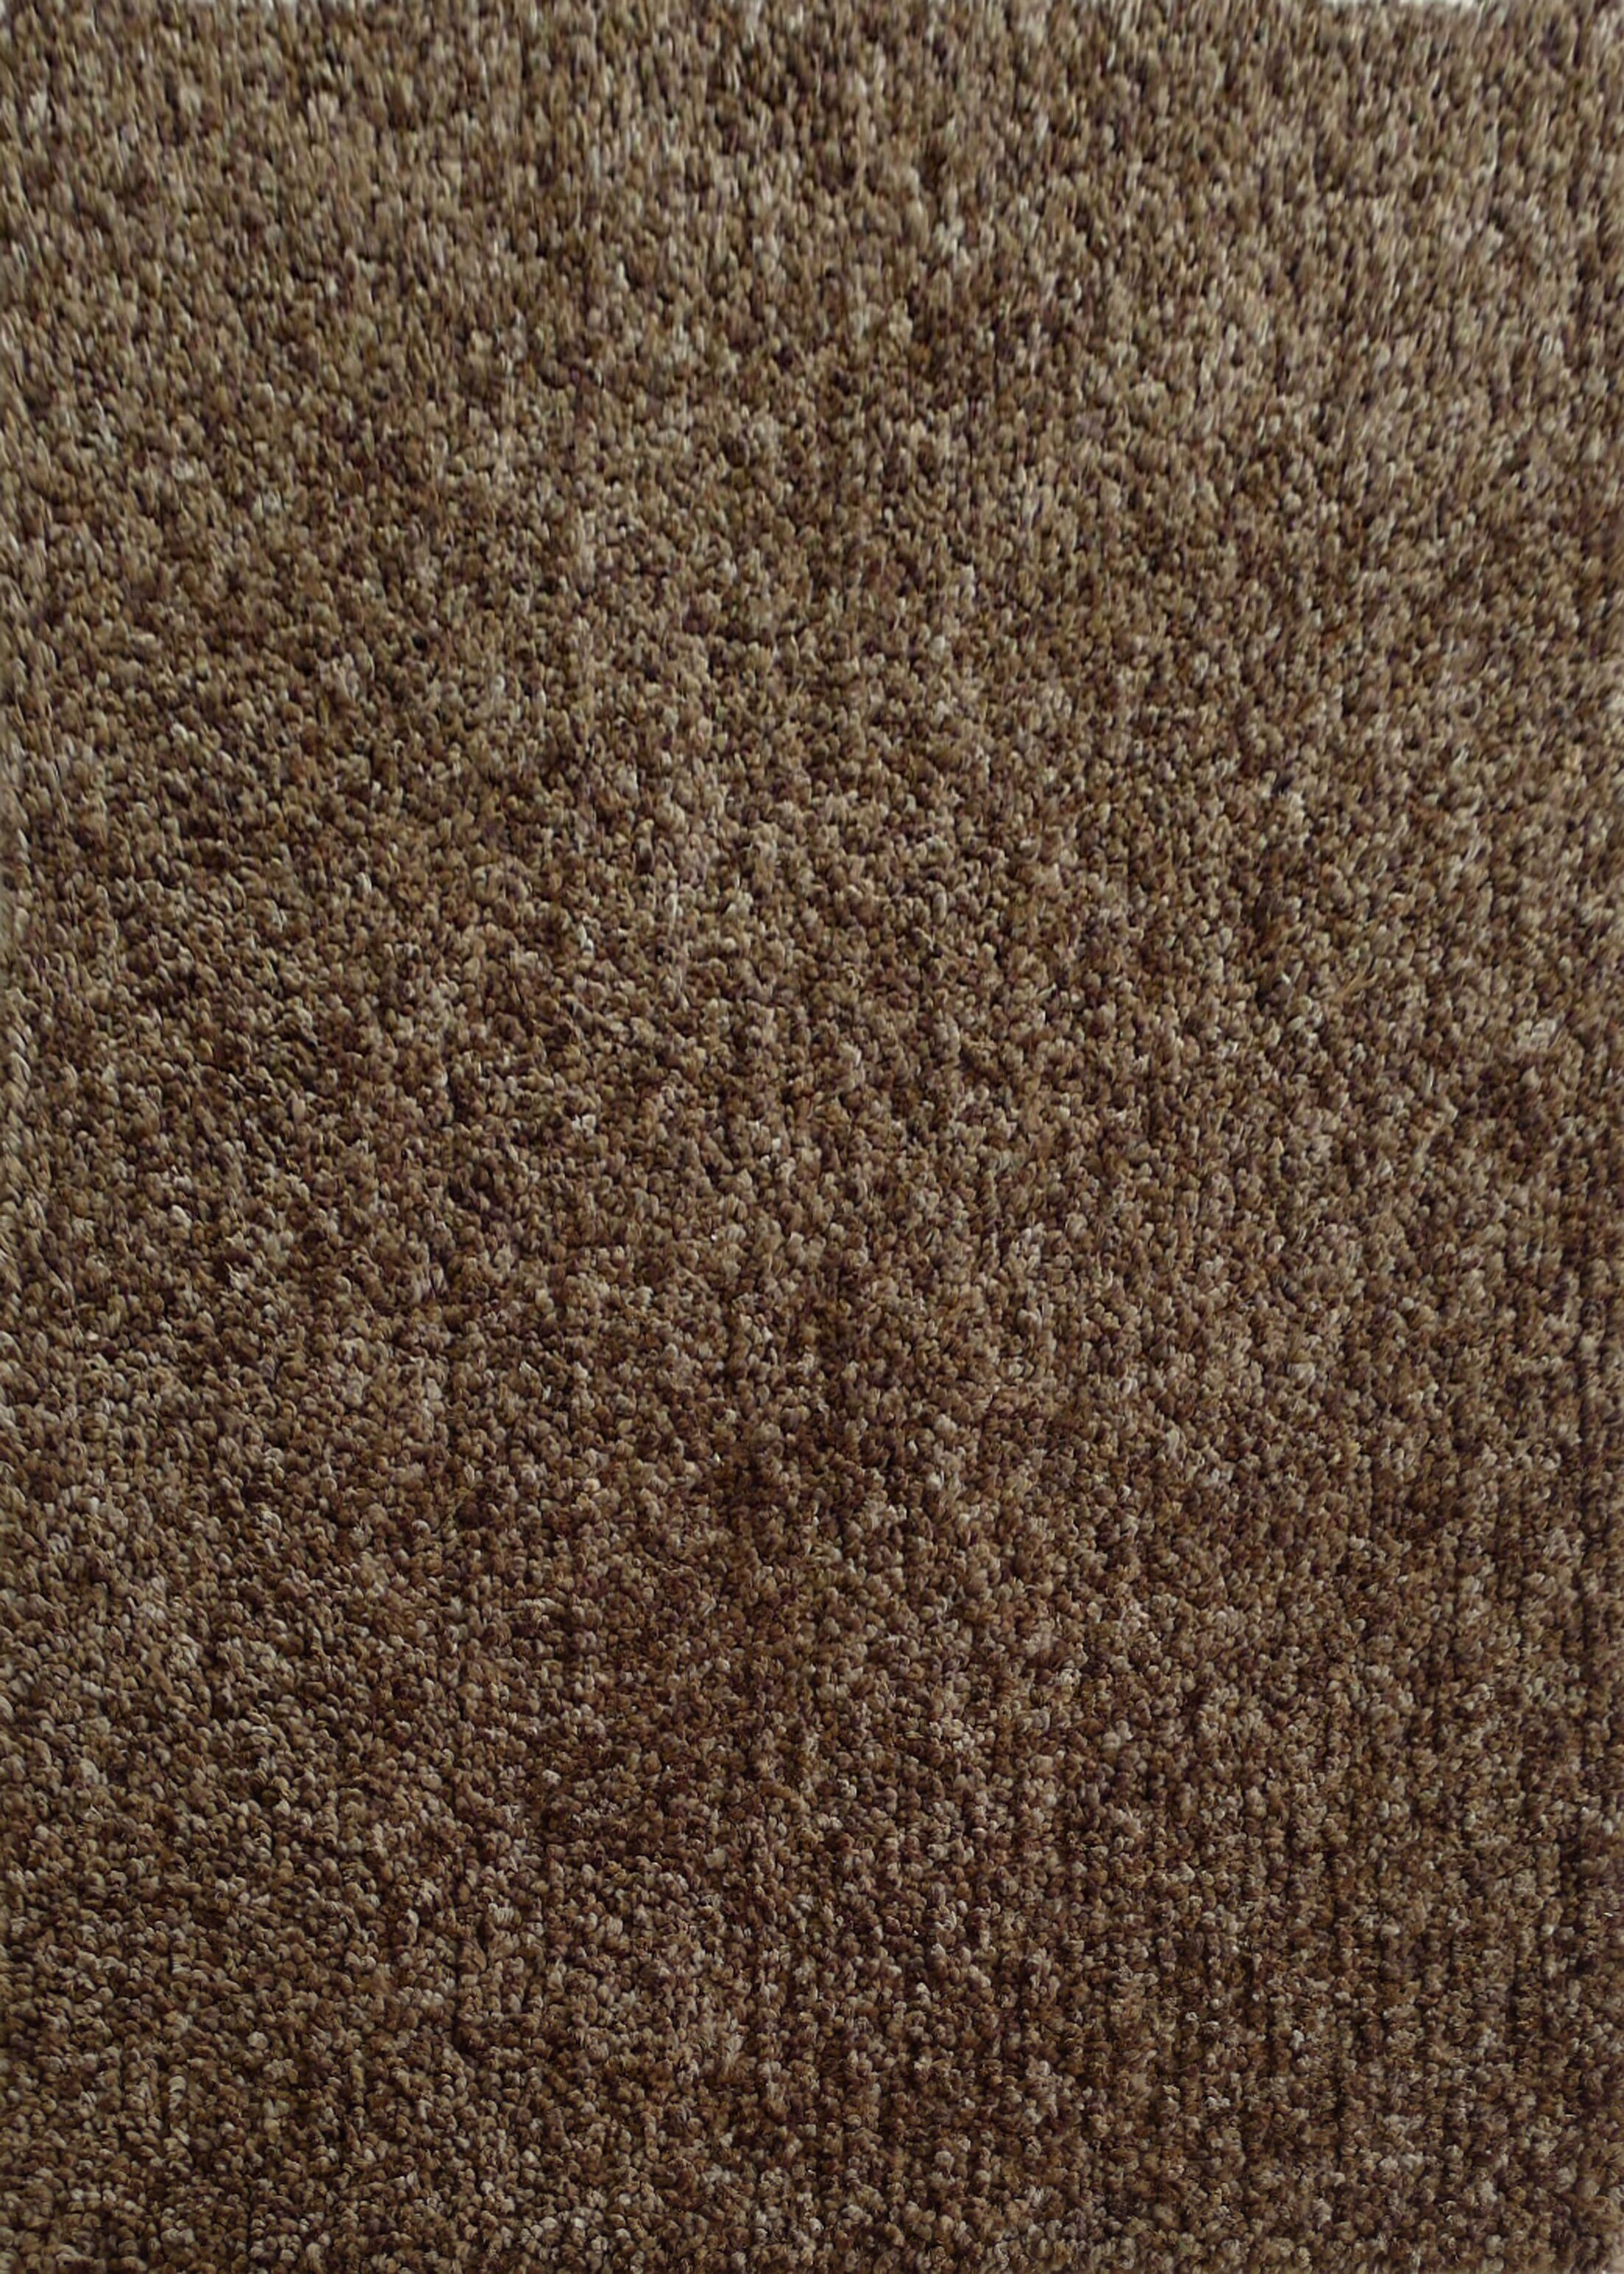 Harmony 2 Toned Winter Gray Shag Area Rug Rug Size: Rectangle 8' x 10'